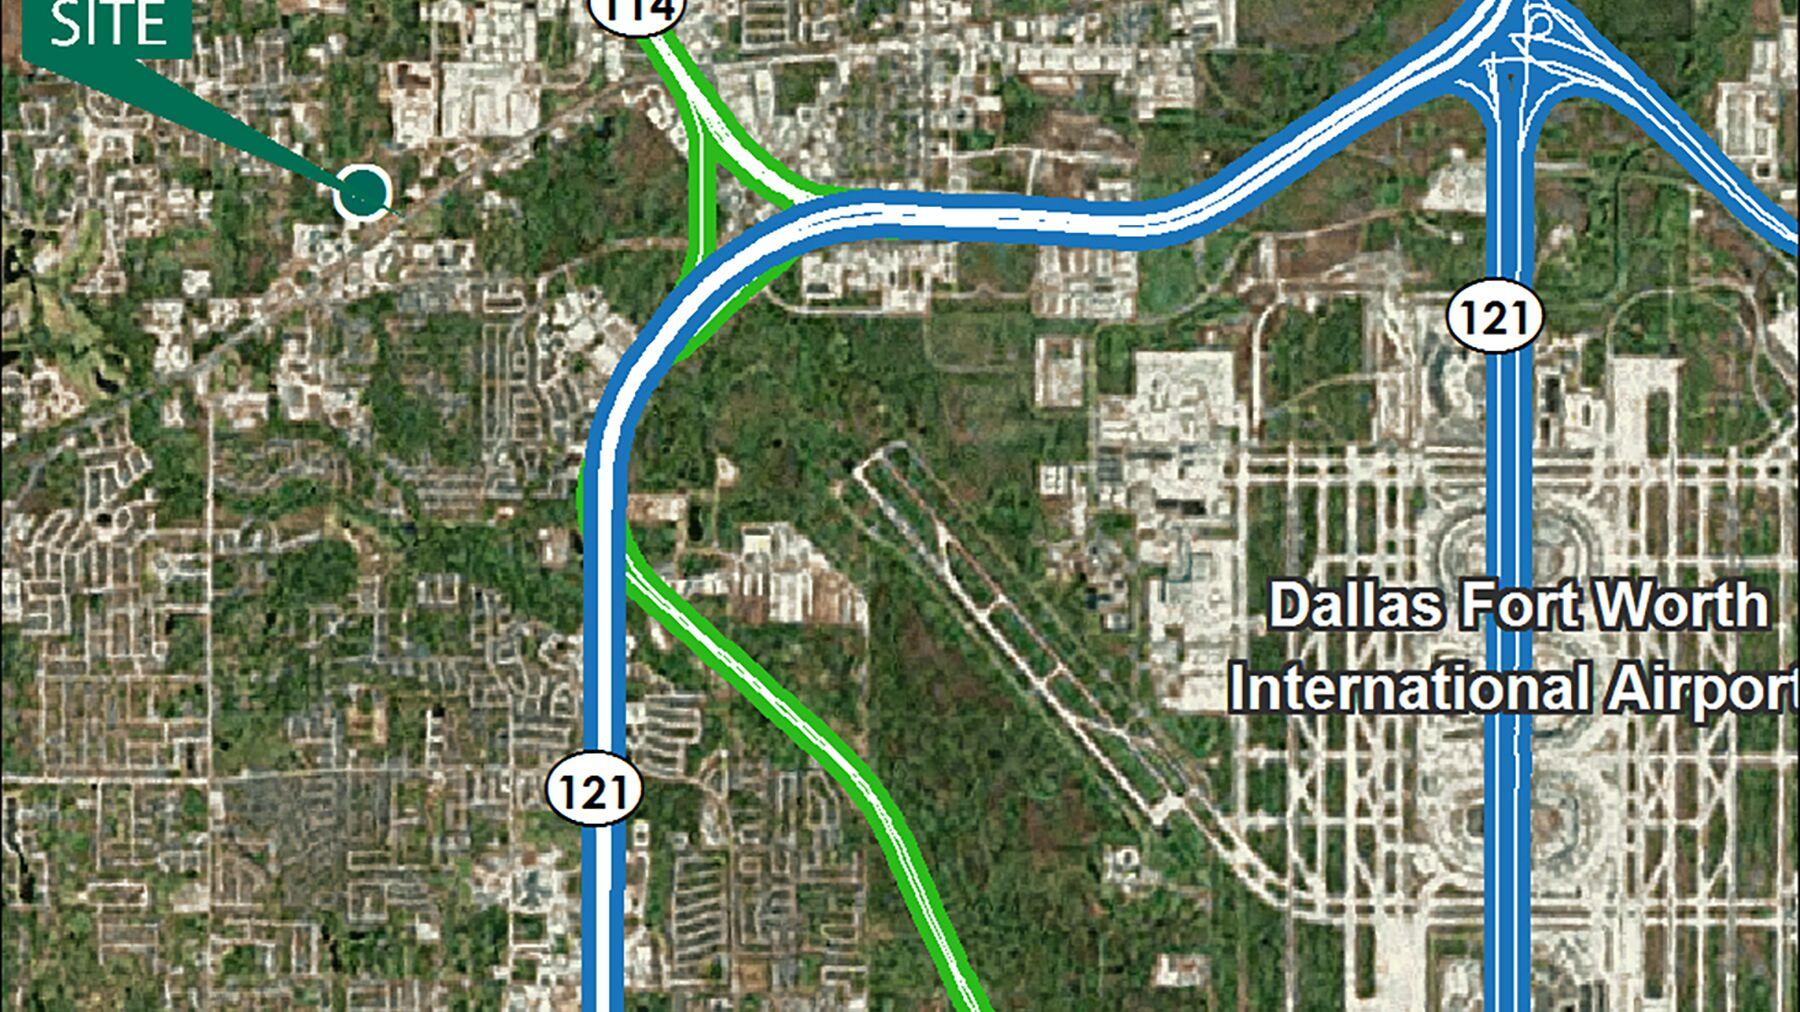 DPM-Prologis-Heritage-Business-Park-9-DAL10509-1070-S-Kimball-Avenue_AerialMap.jpg